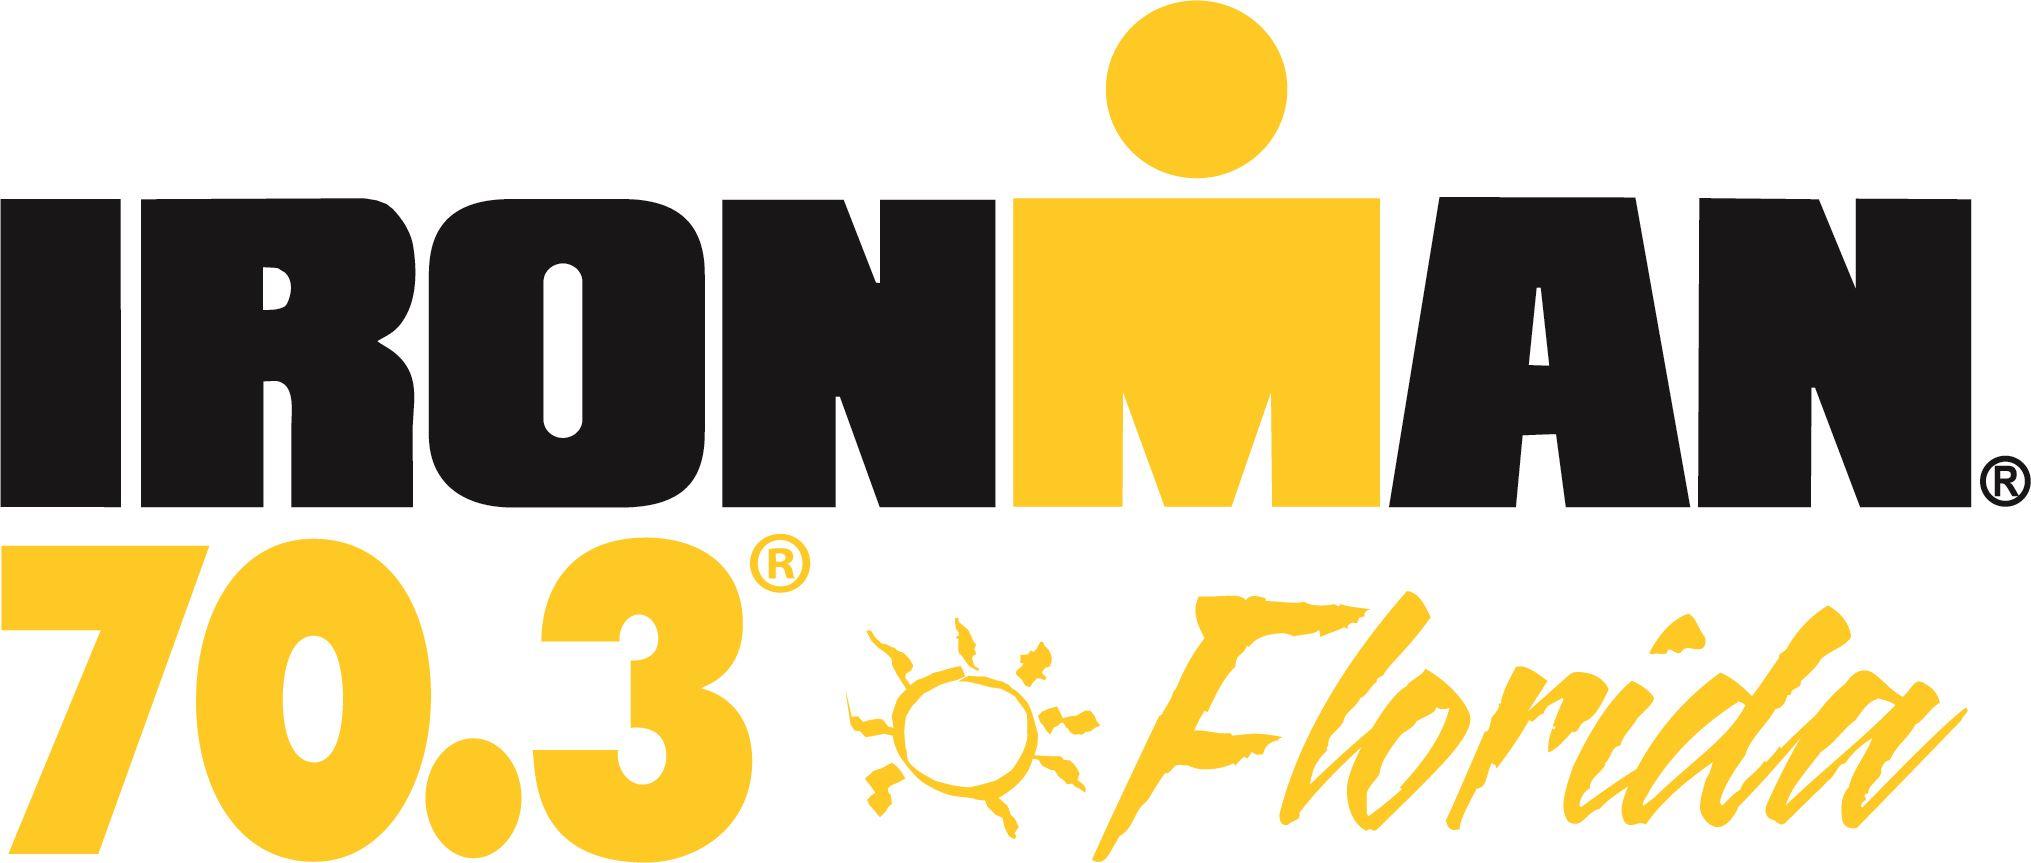 RaceThread.com Ironman 70.3 Florida